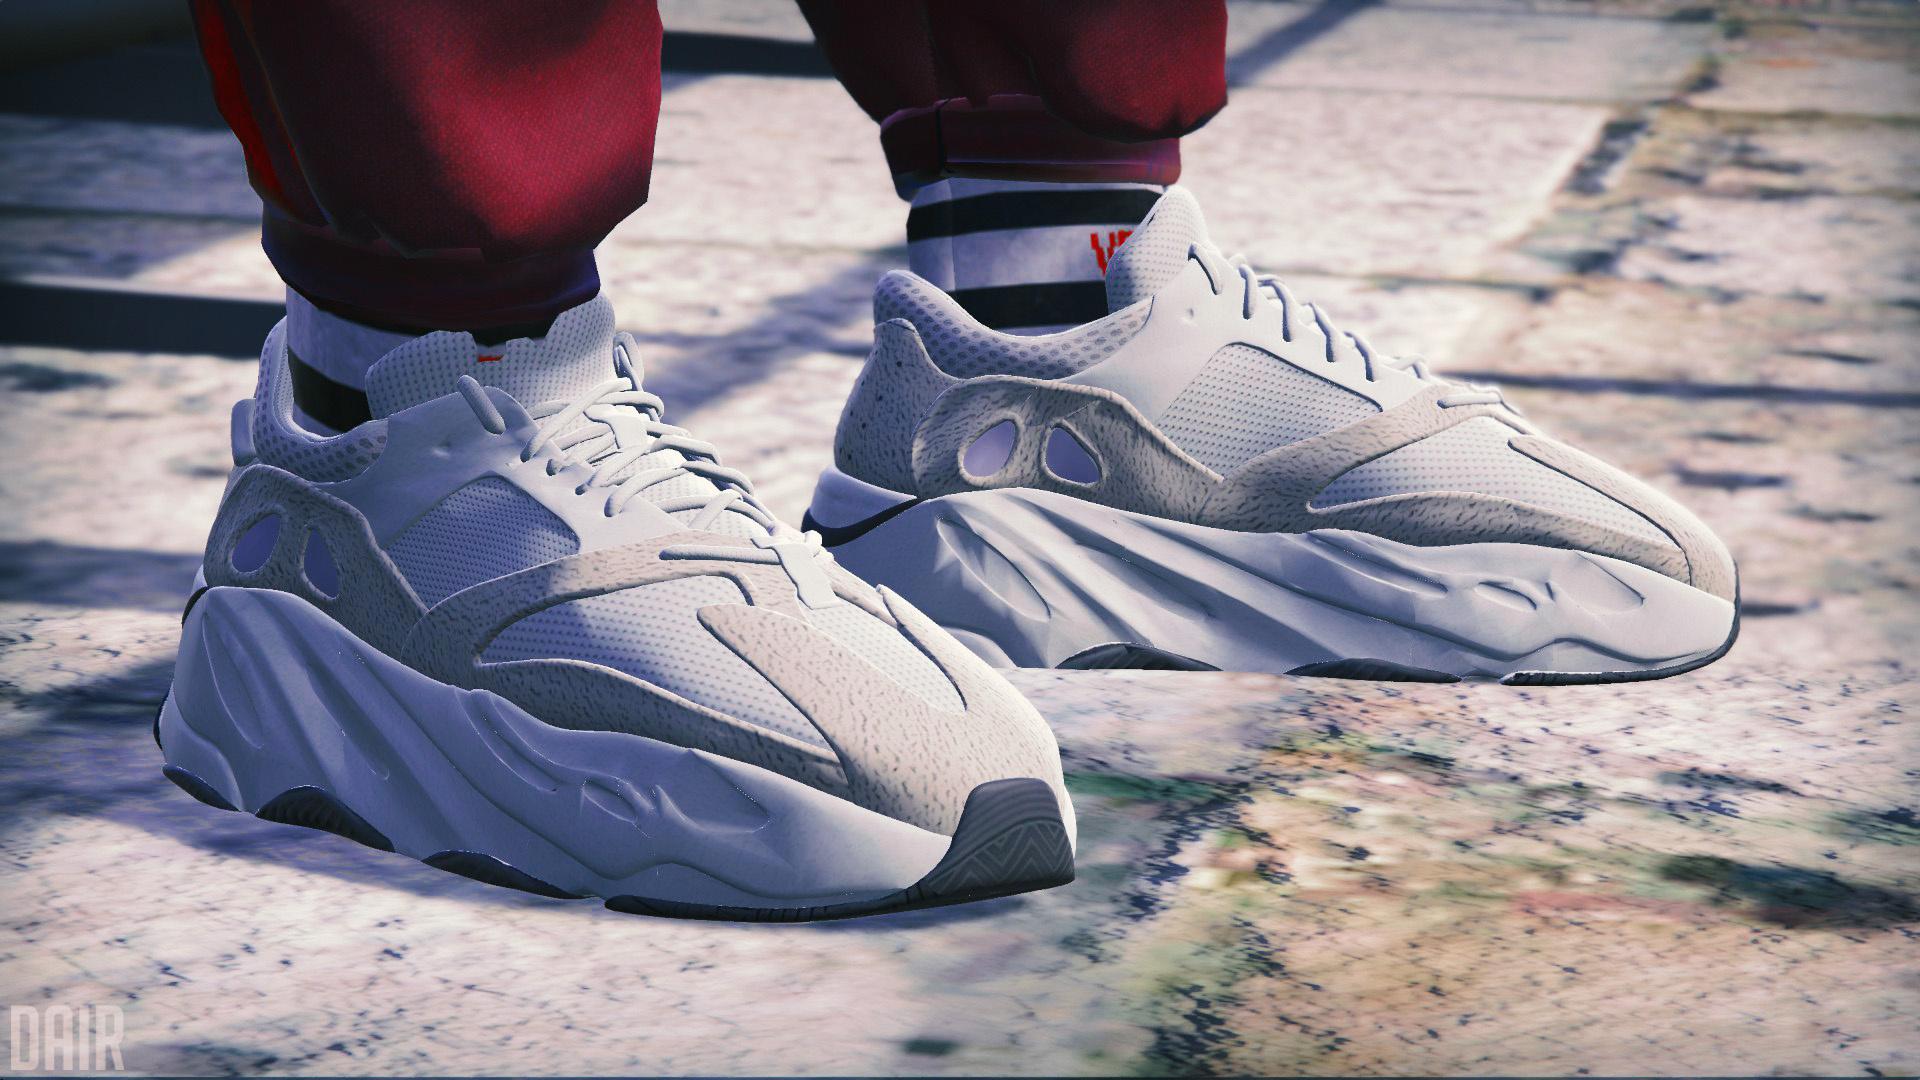 c1d65779f Adidas Yeezy Boost 700 Pack (Mauve